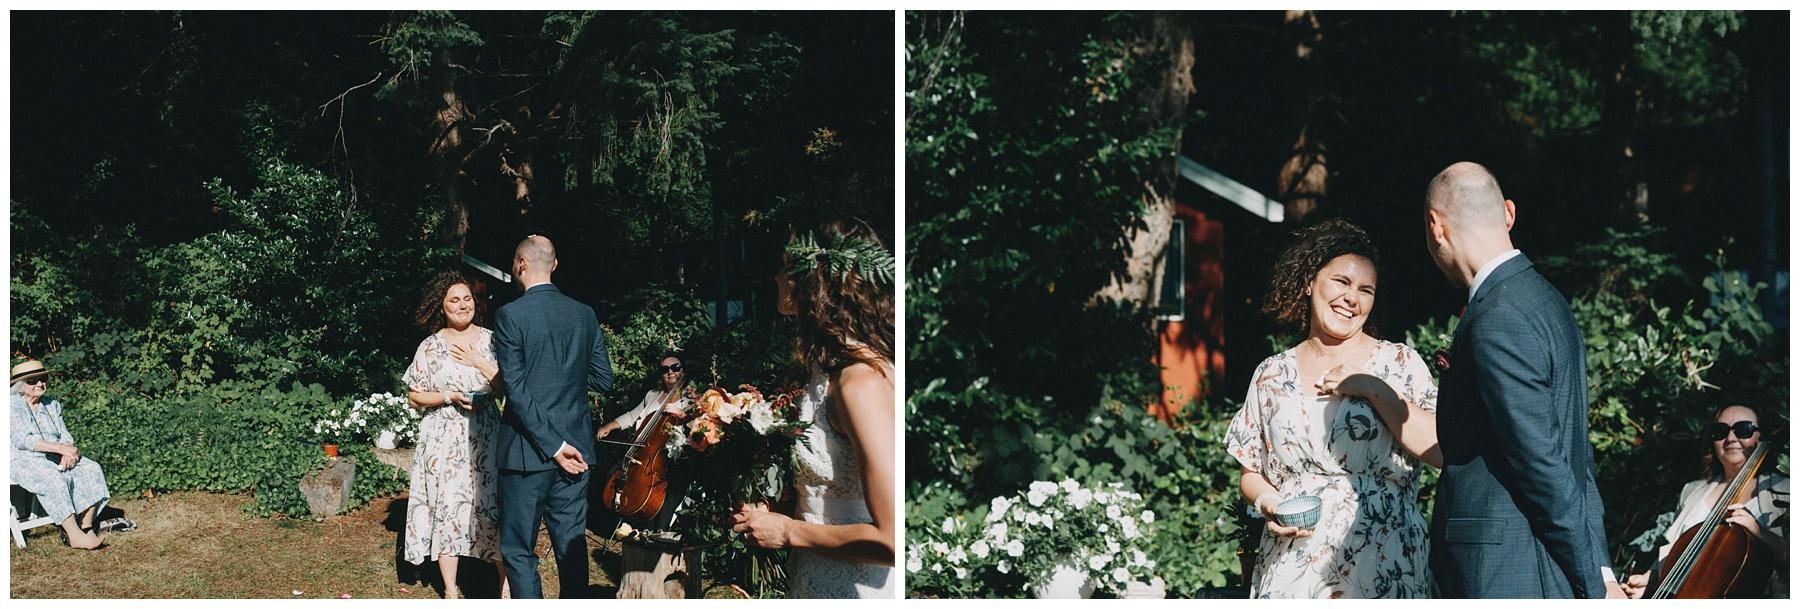 Vancouver intimate Wedding Photographer_0517.jpg